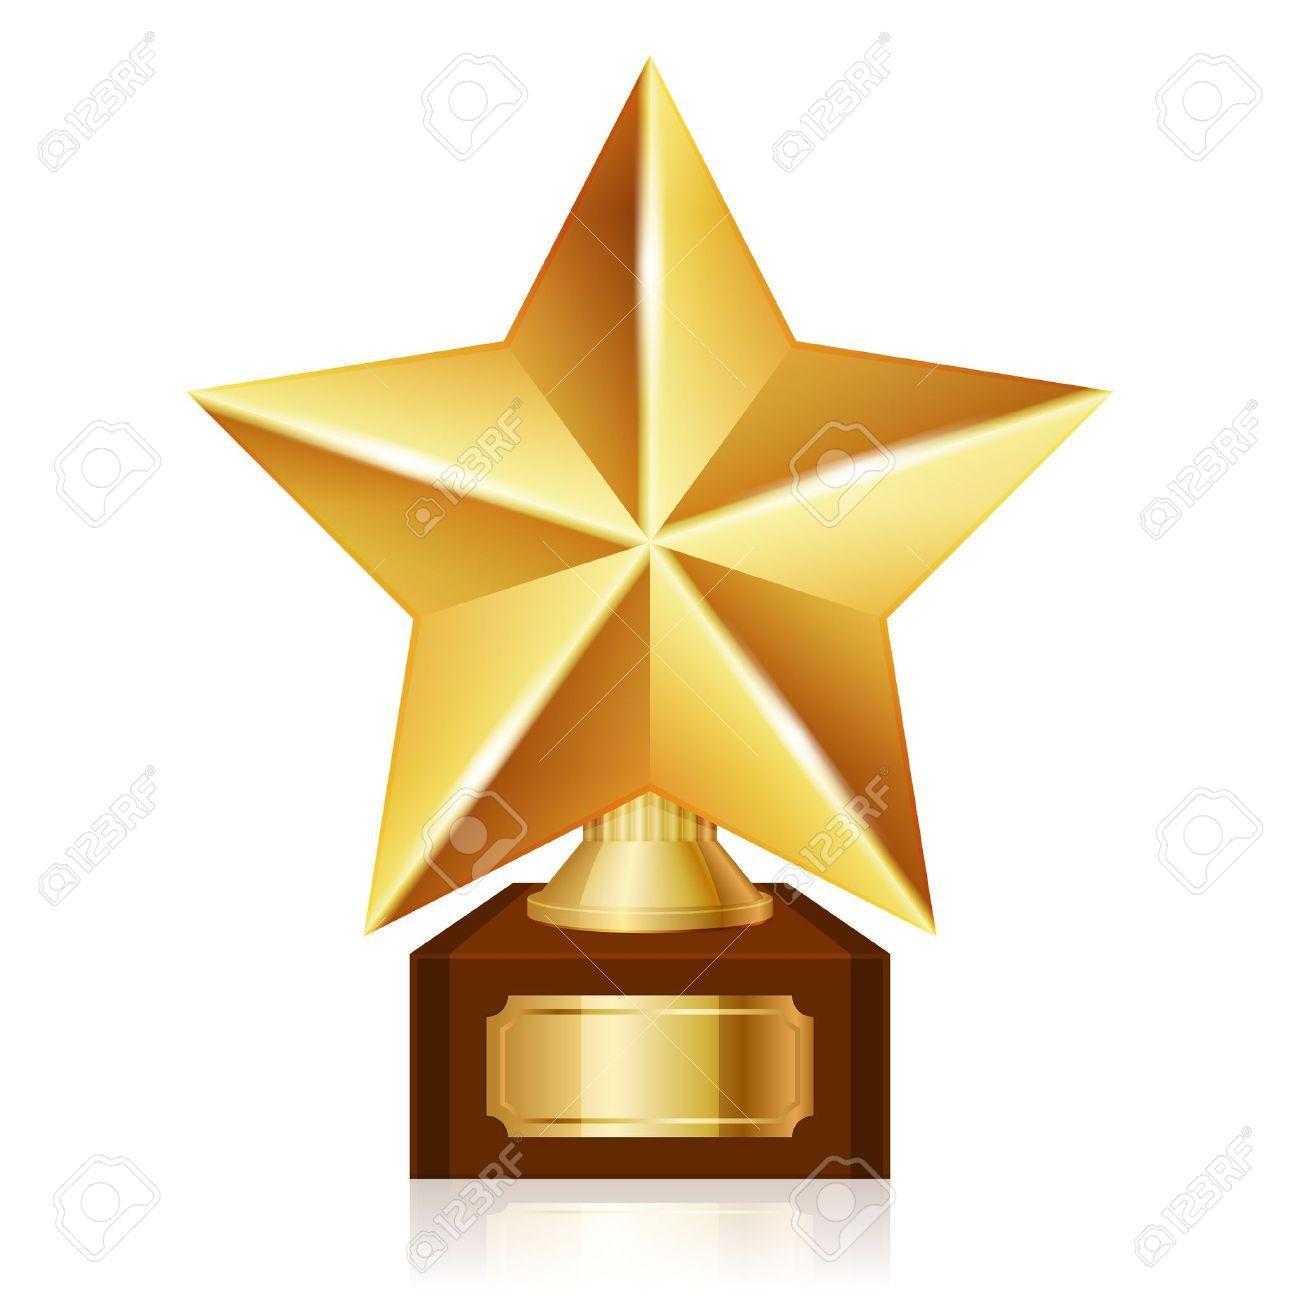 Star awards clipart » Clipart Portal.